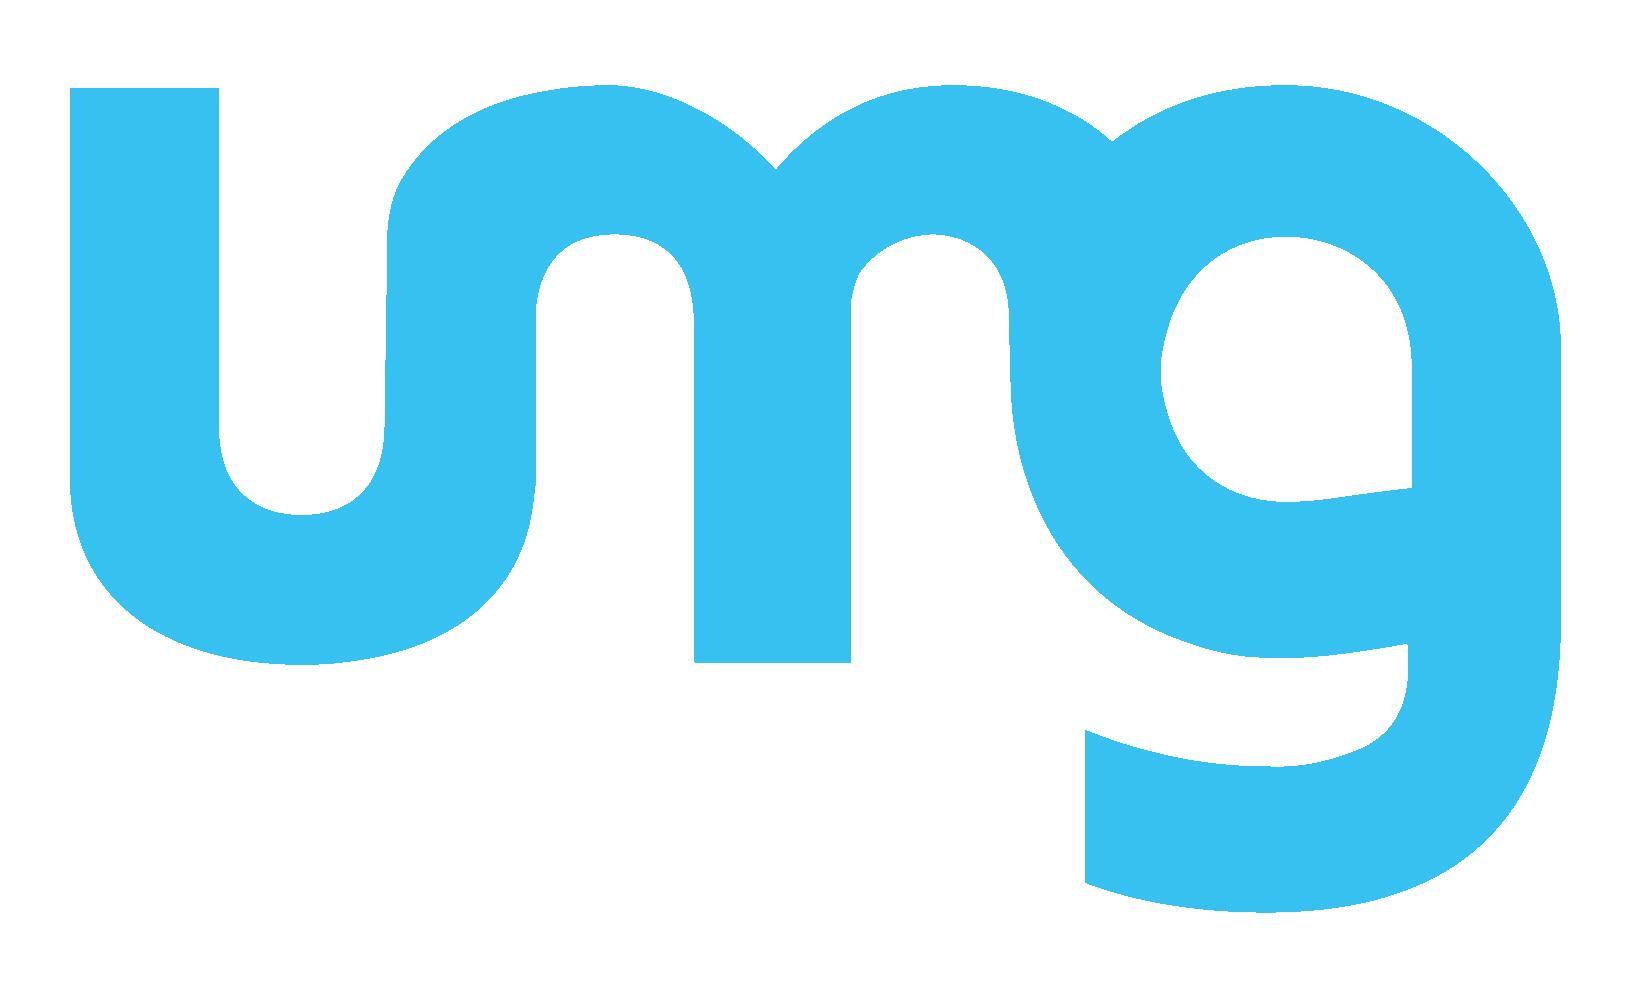 Greenlink Receives Hispanic Marketing Plan from UMG.